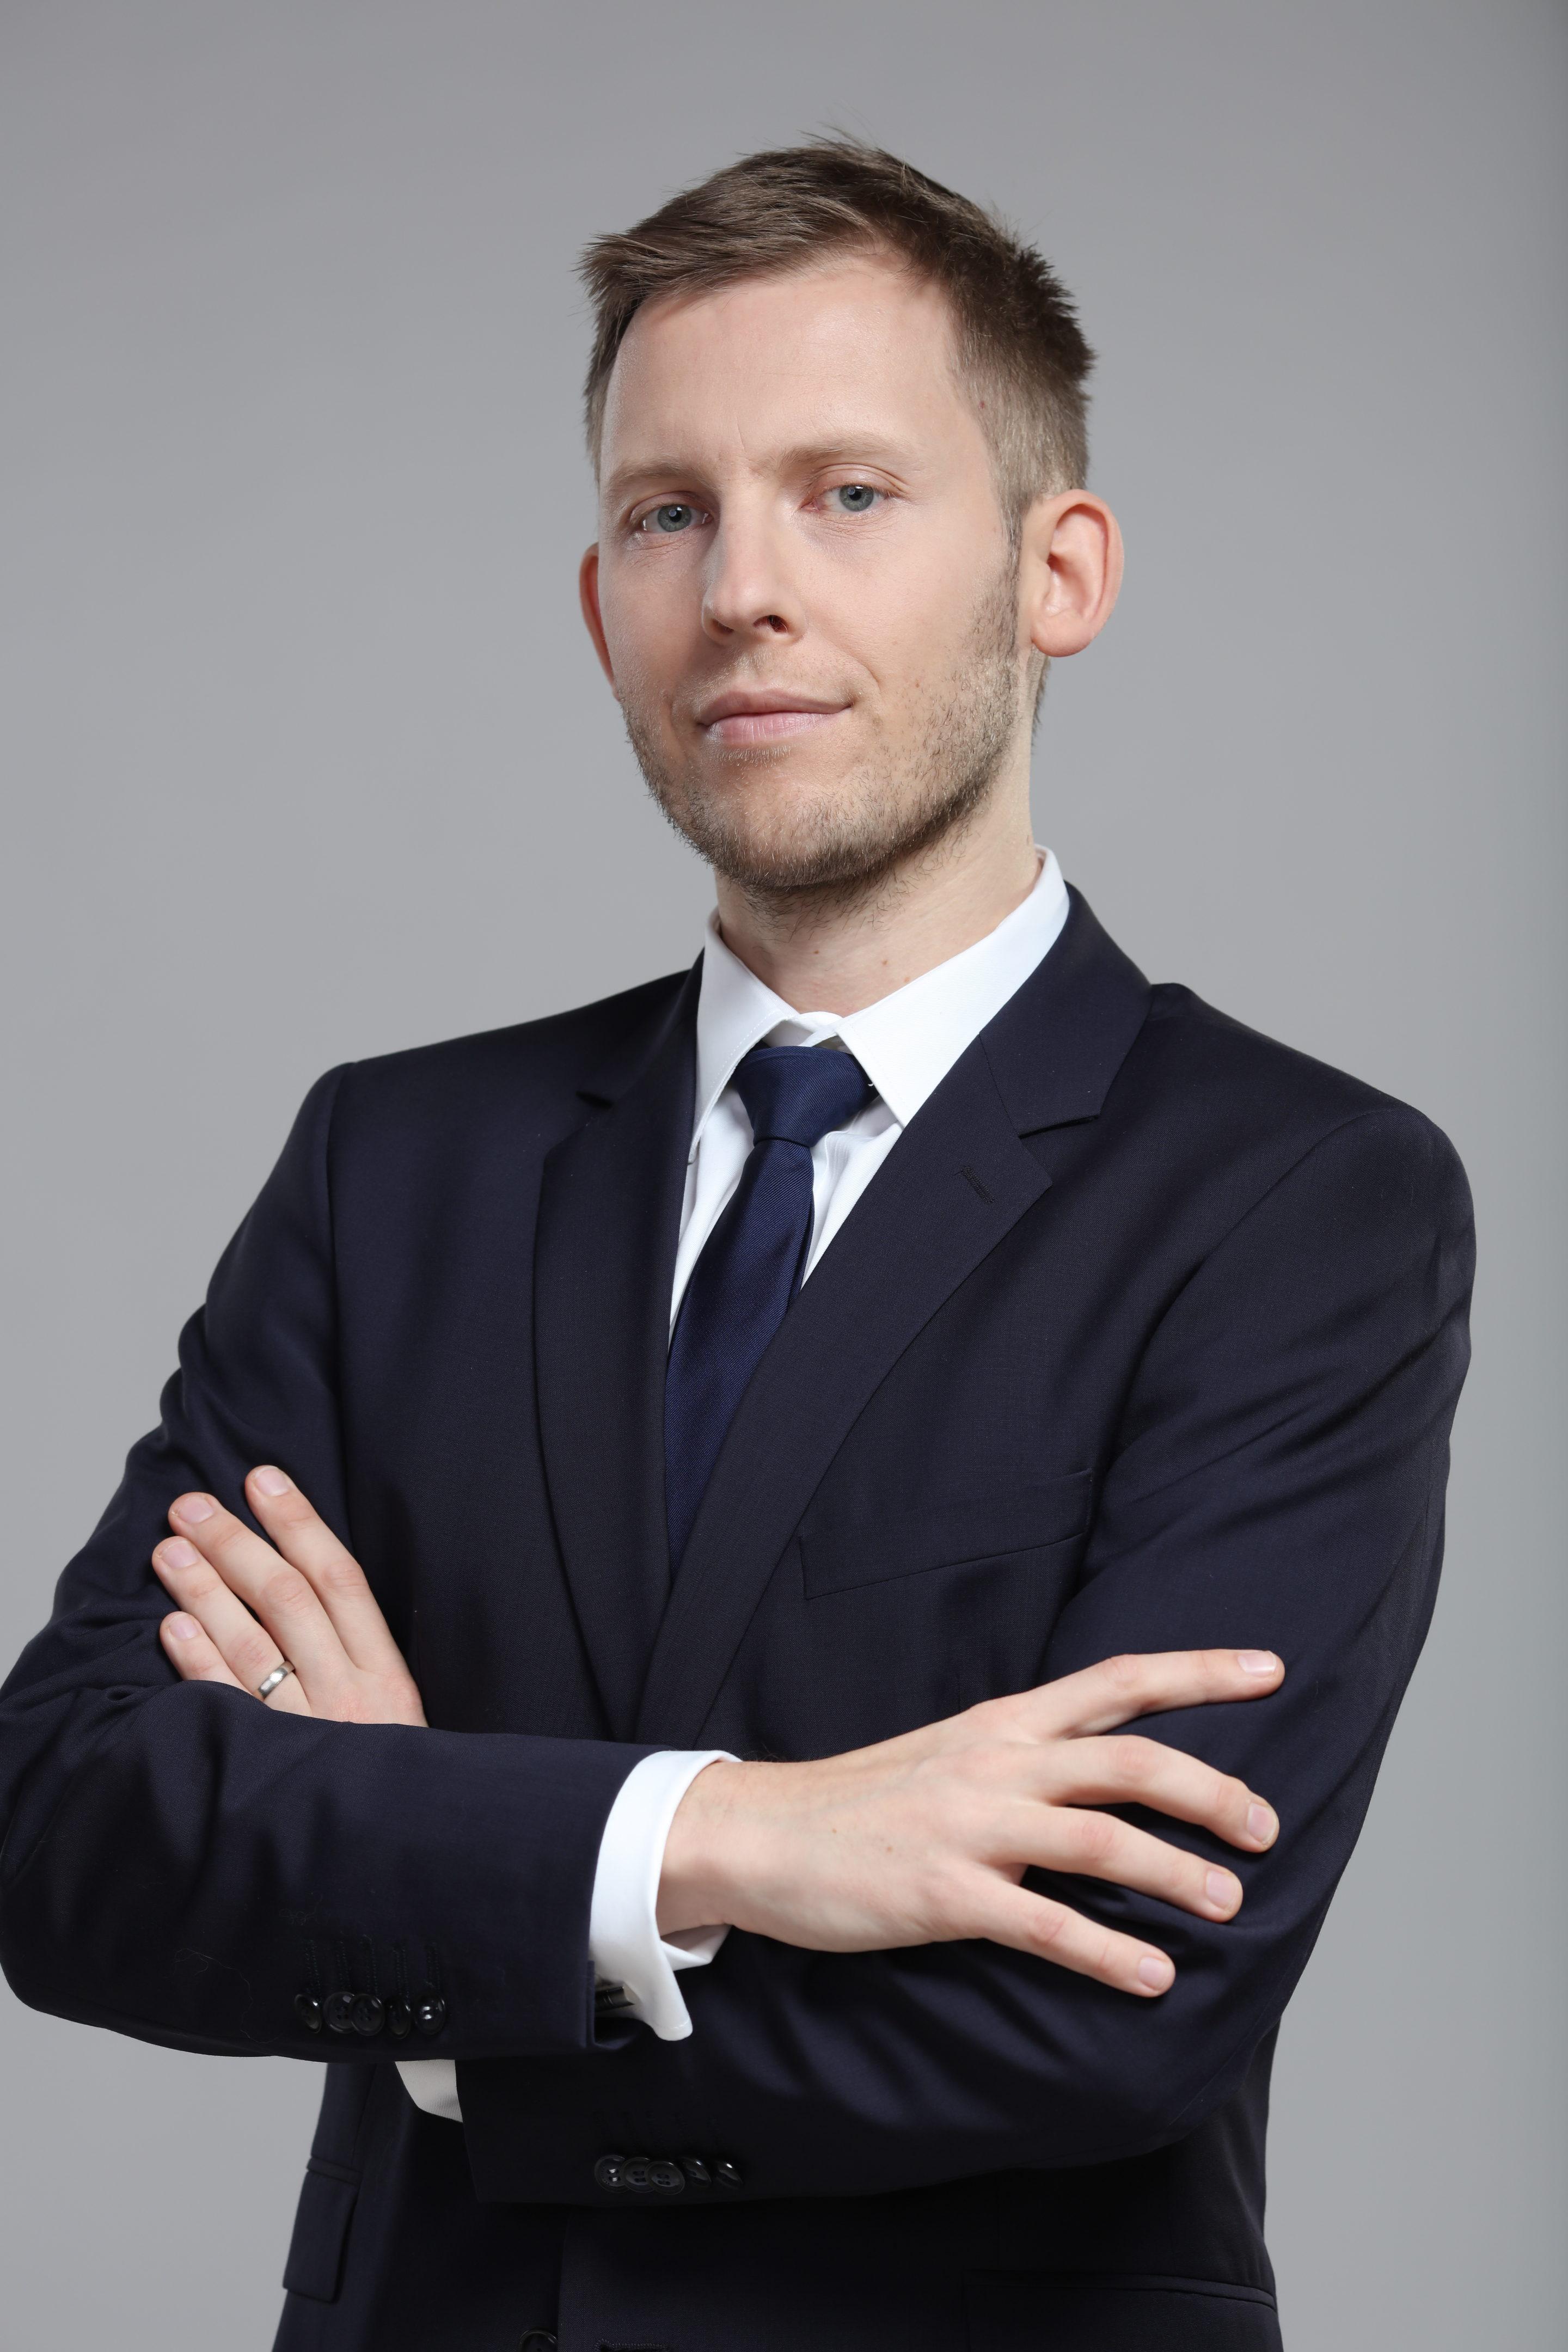 Christopher Dankowski